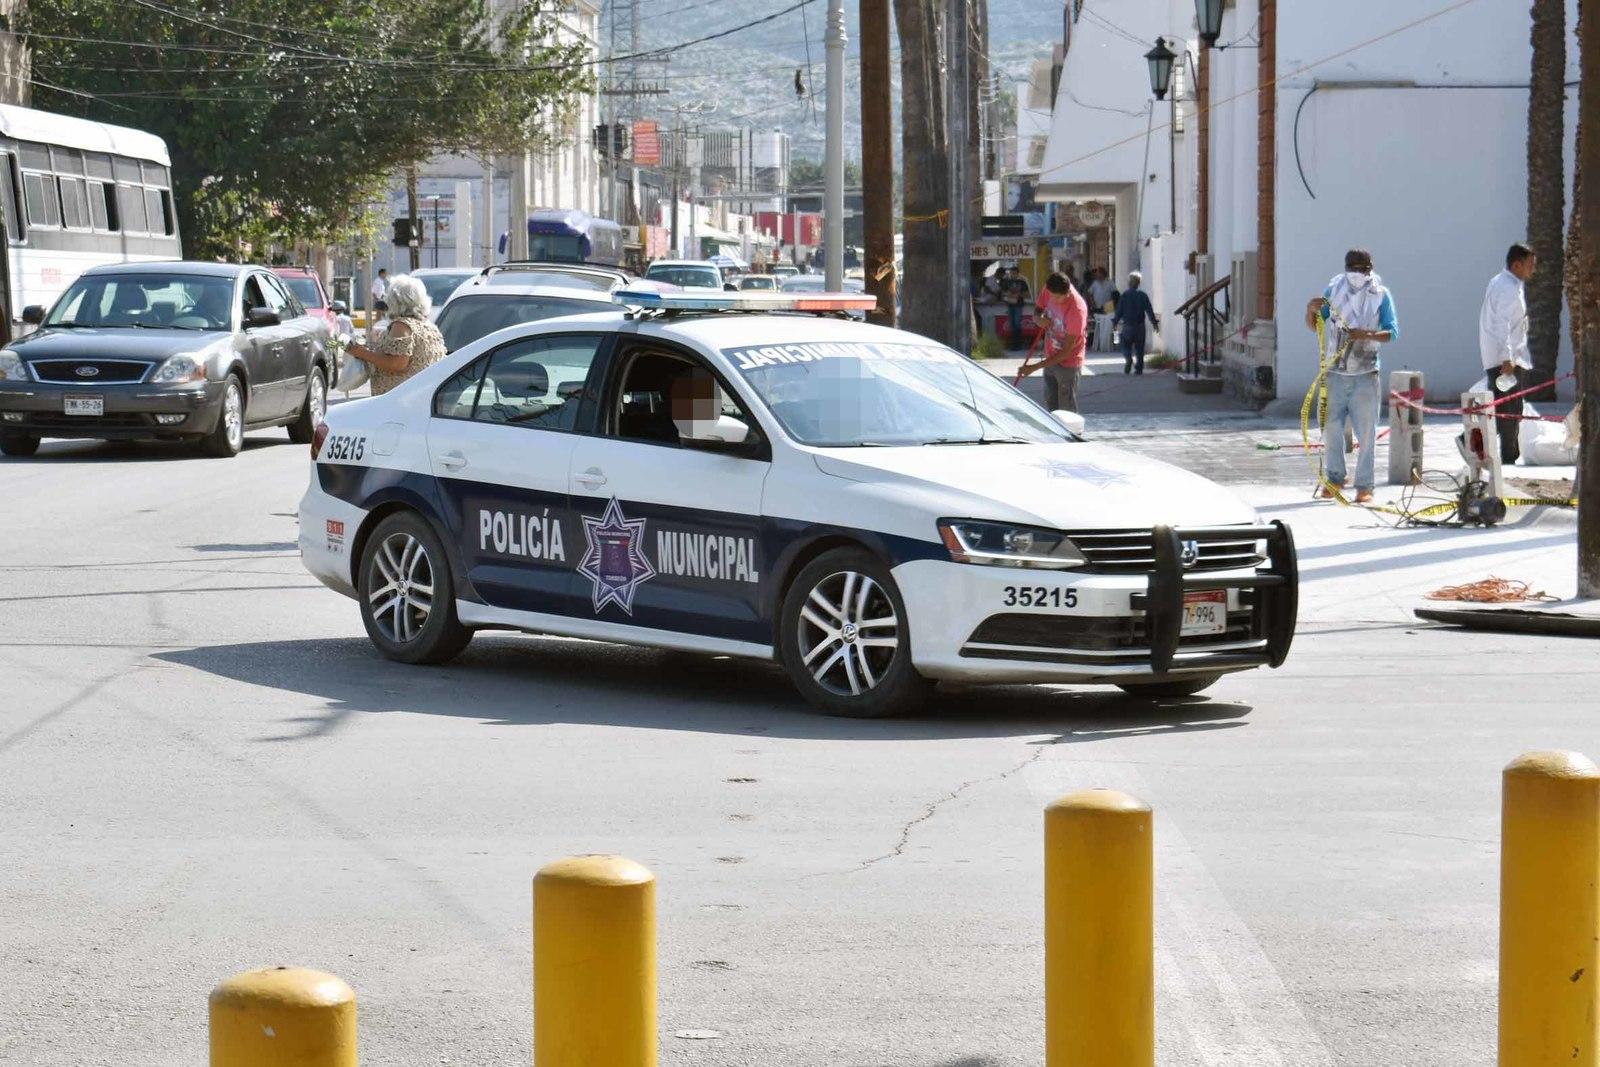 Policías, víctimas de conducta antisocial